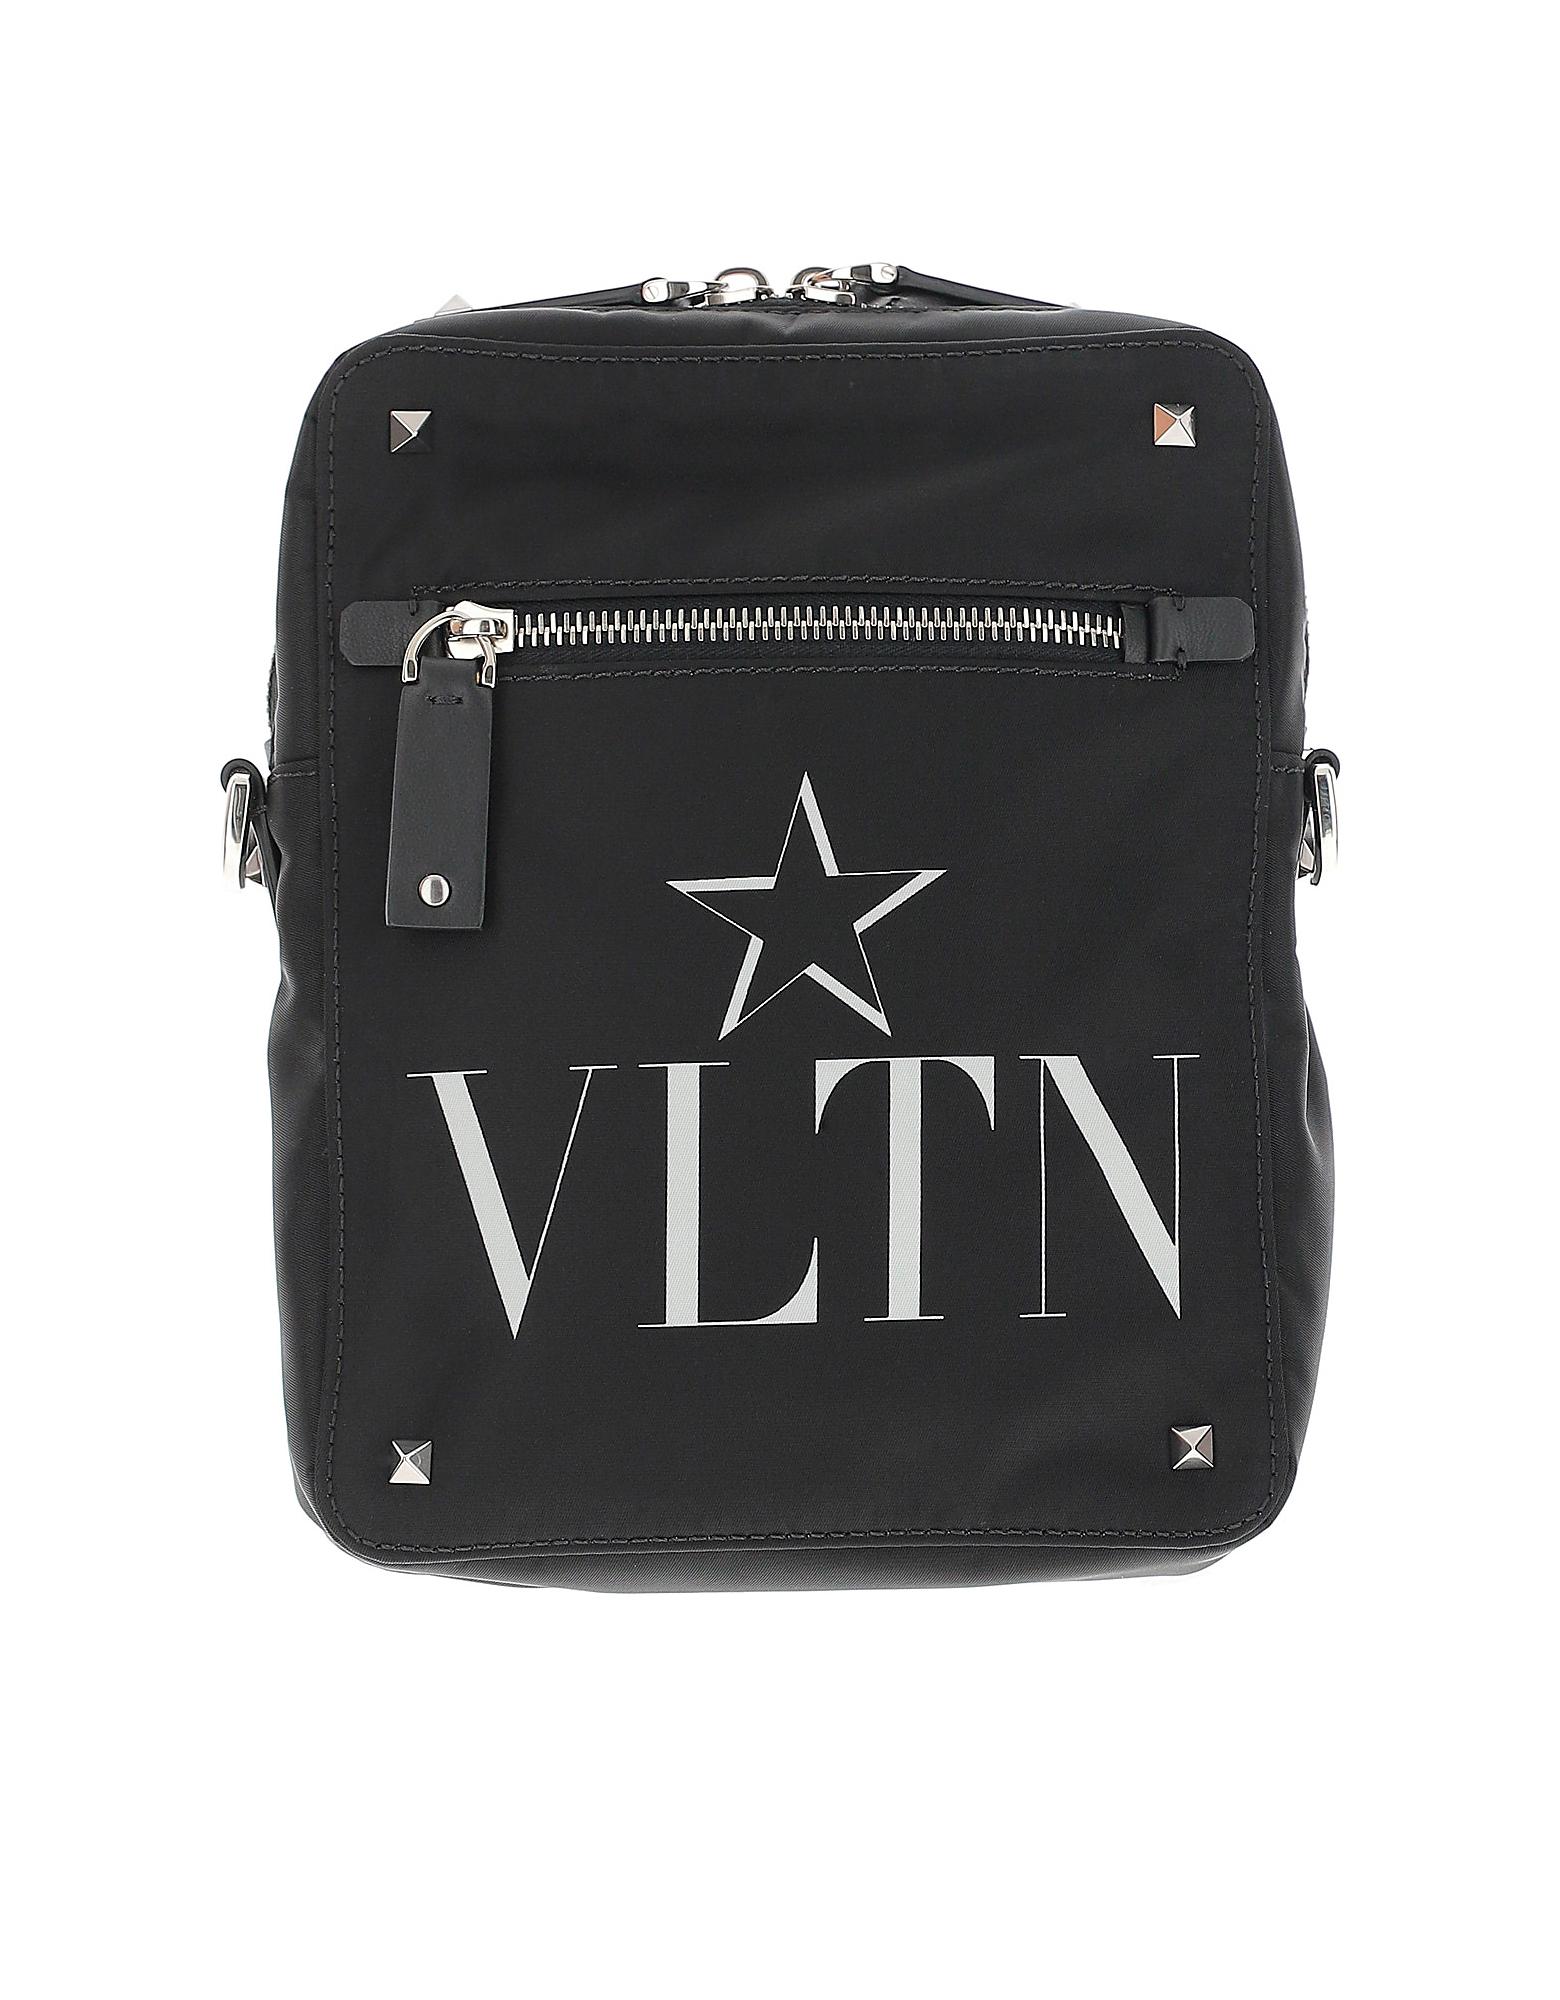 Valentino Designer Men's Bags, Black Nylon Signature and Star Crossbody Bag